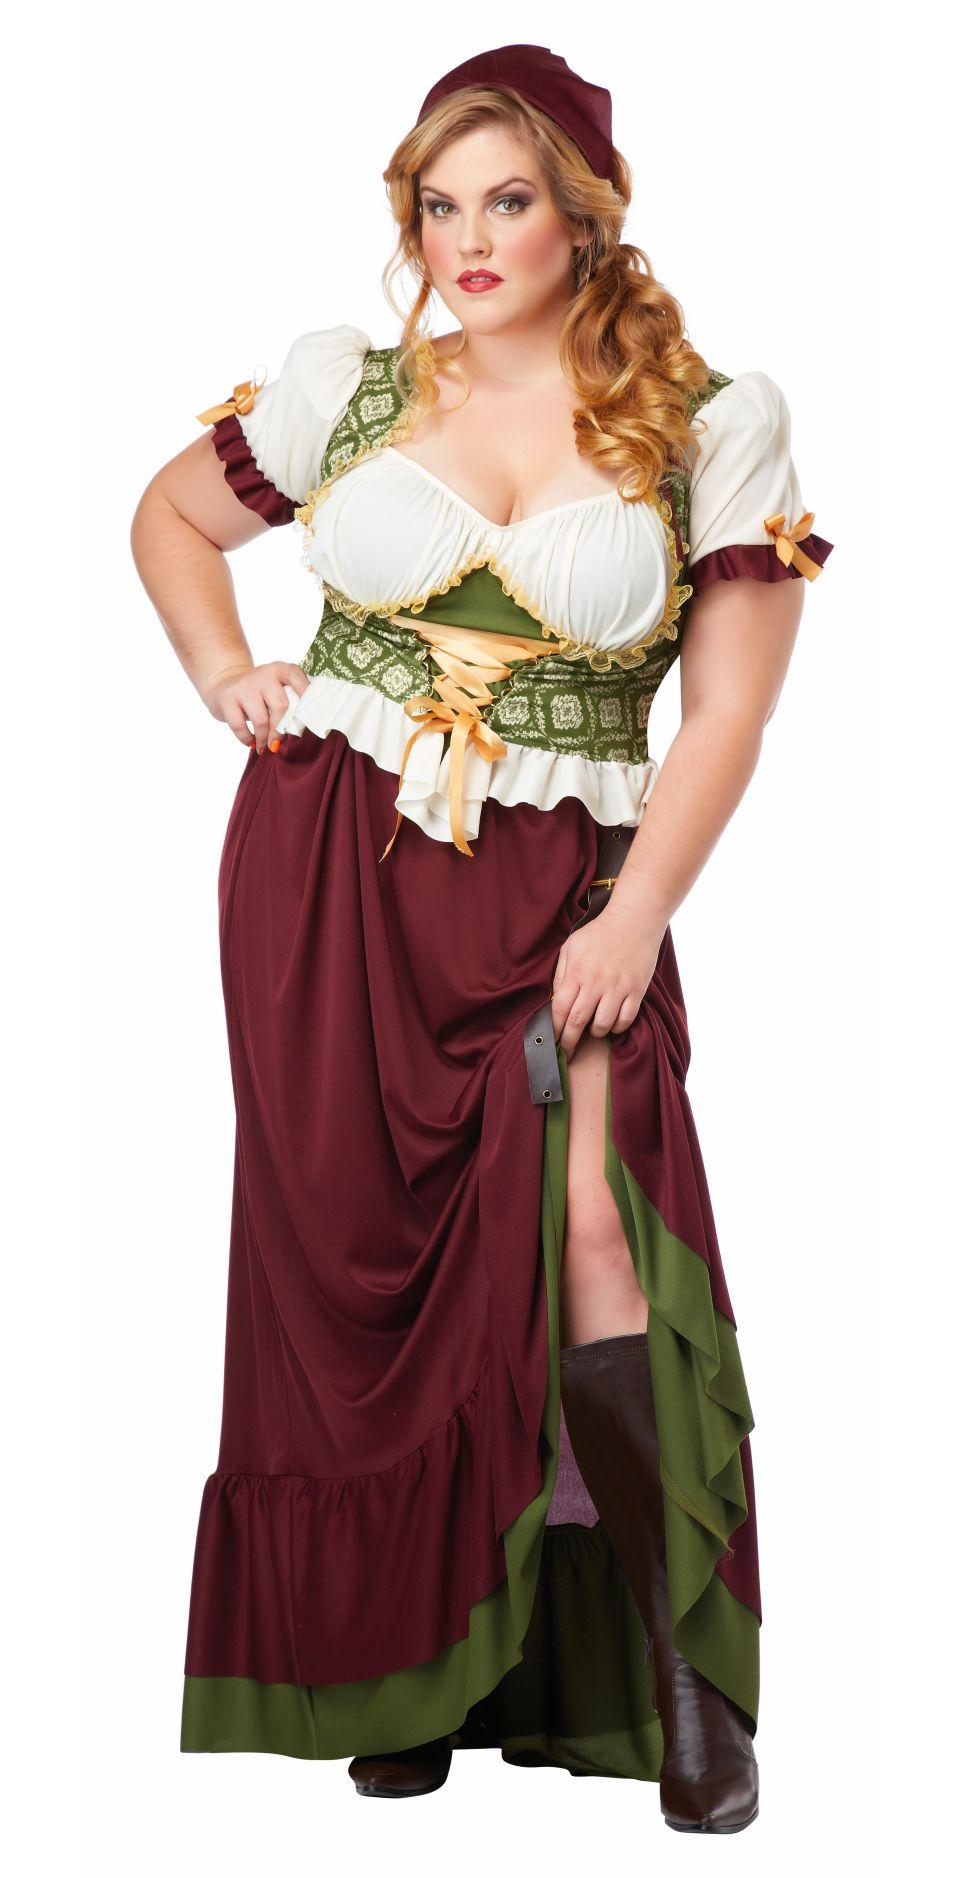 Fancy dress plus size costumes australia